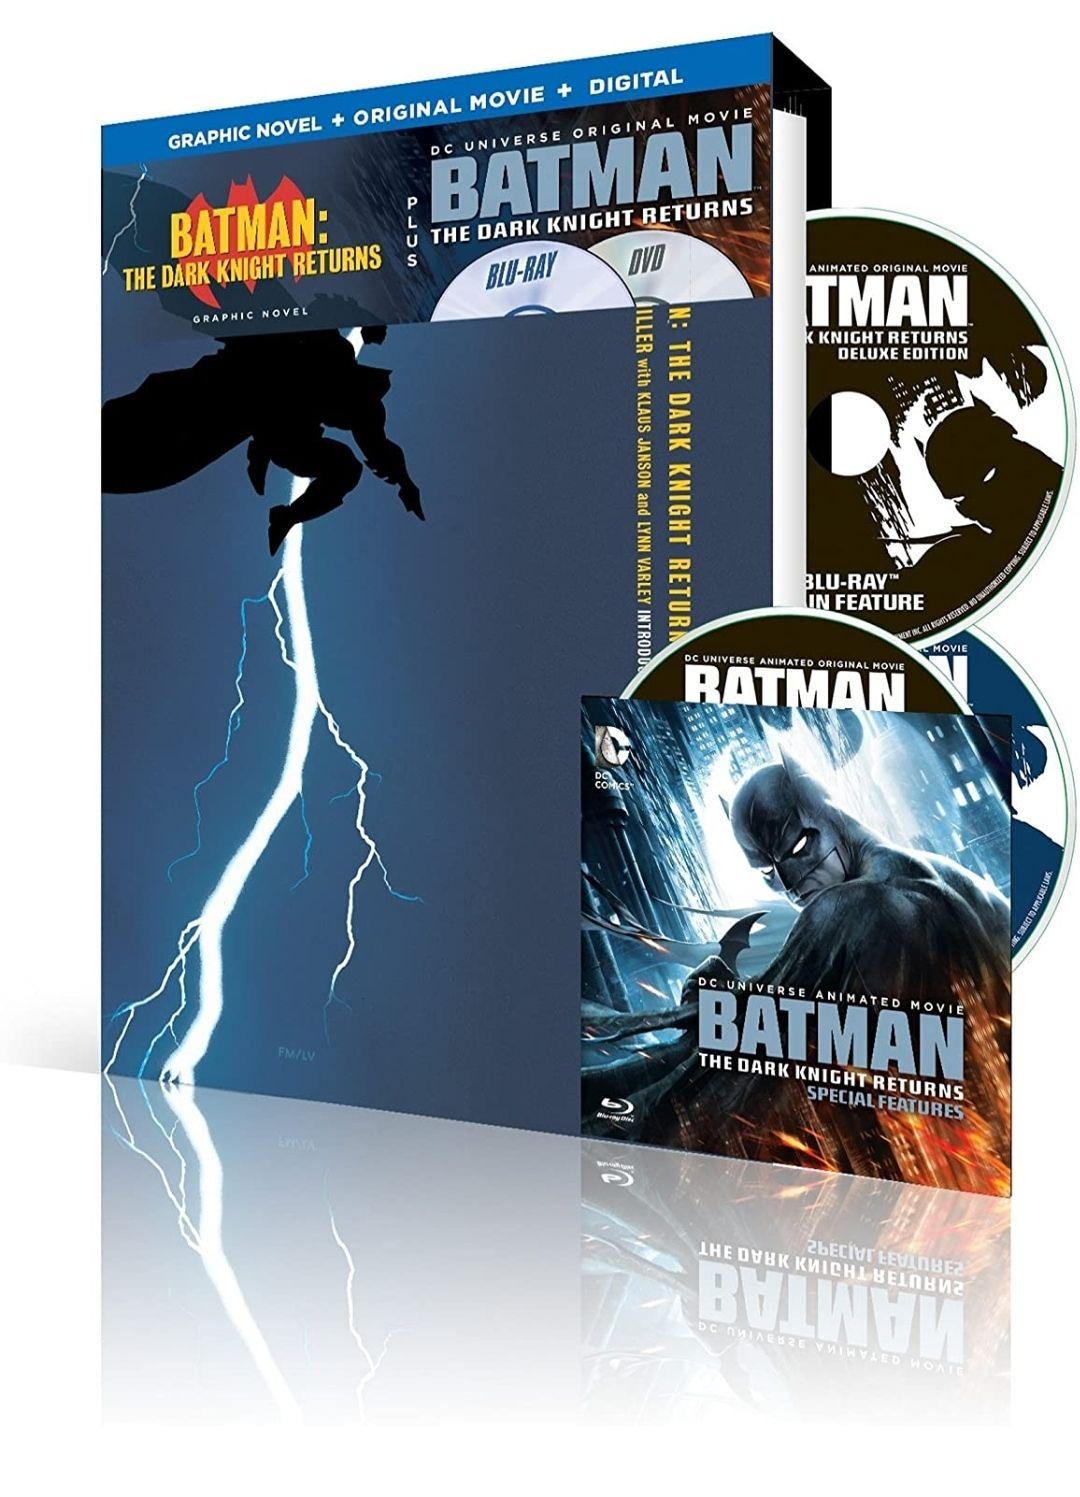 Amazon: The Dark Night Returns - Novela Gráfica, Bluray y Copia Digital